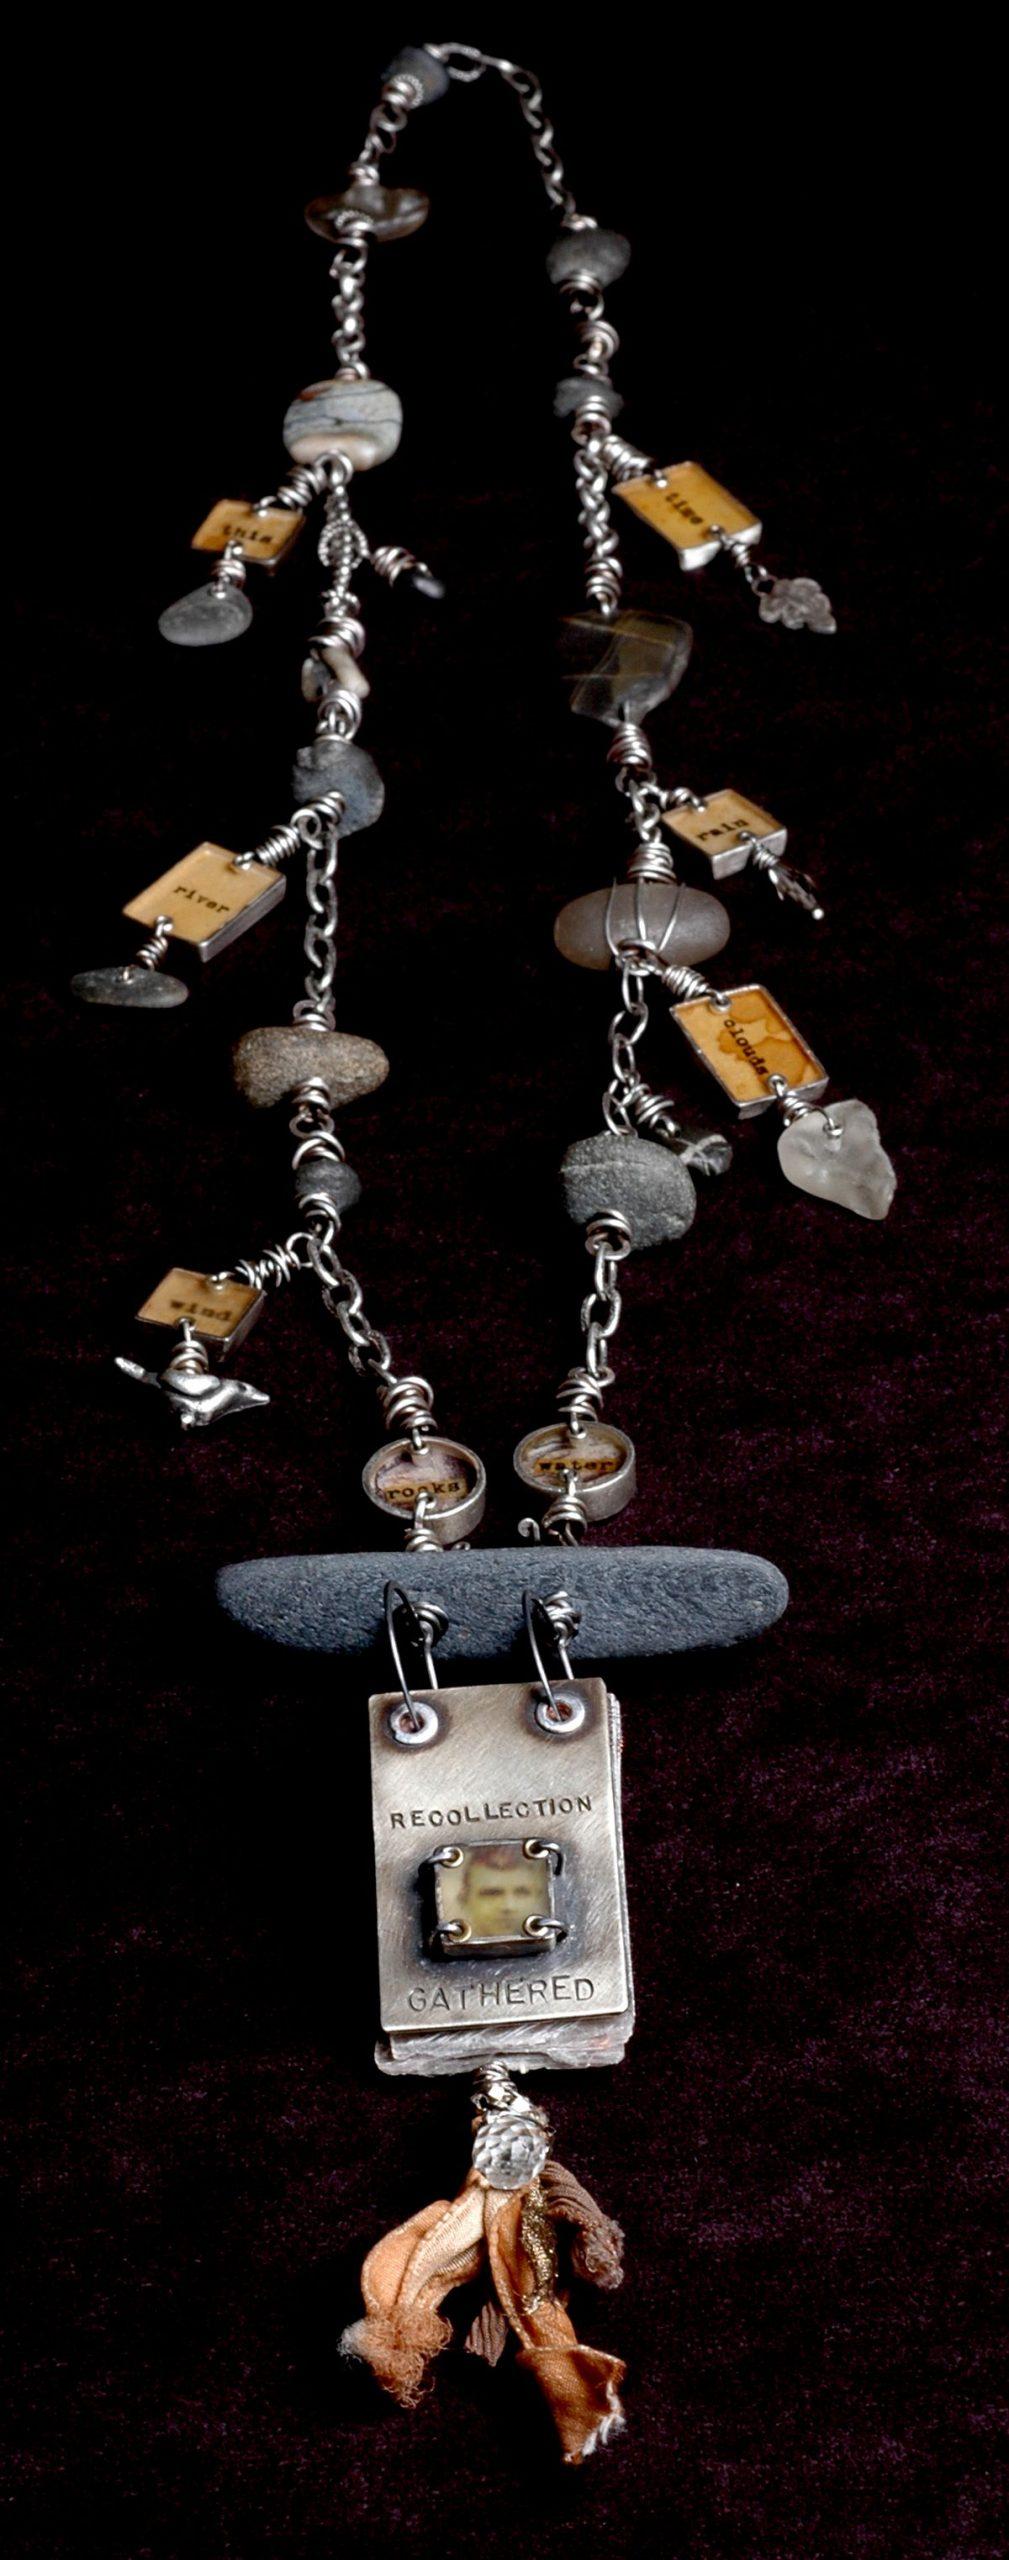 bellewest-jewelry-necklaces-22658804362132181